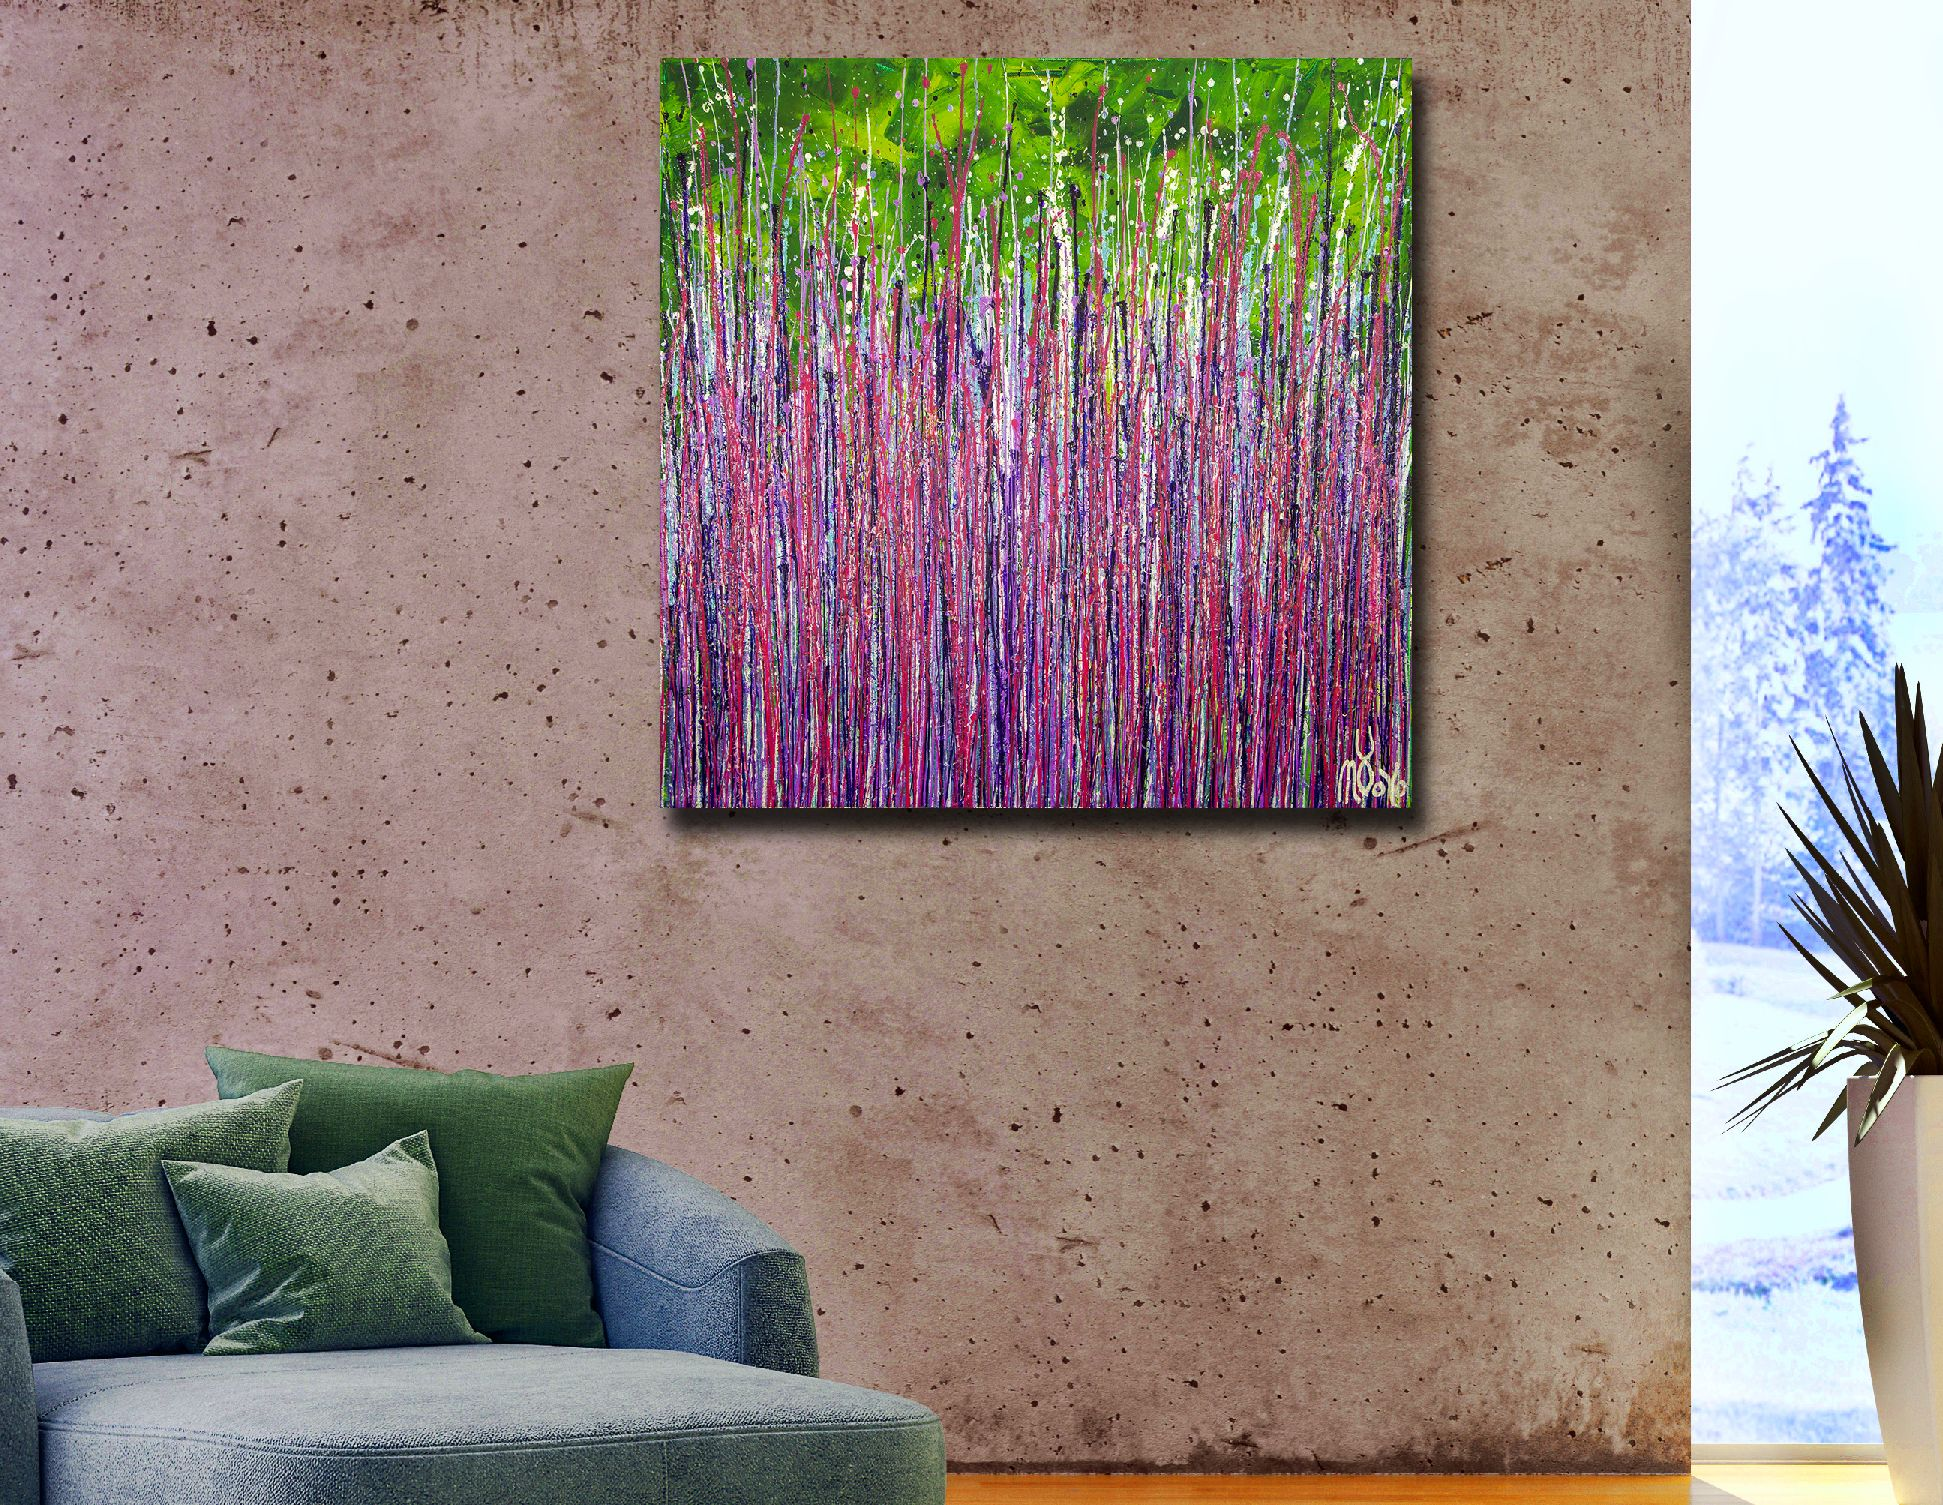 Garden in motion 3 (2020) by Nestor Toro / 30x30 inches